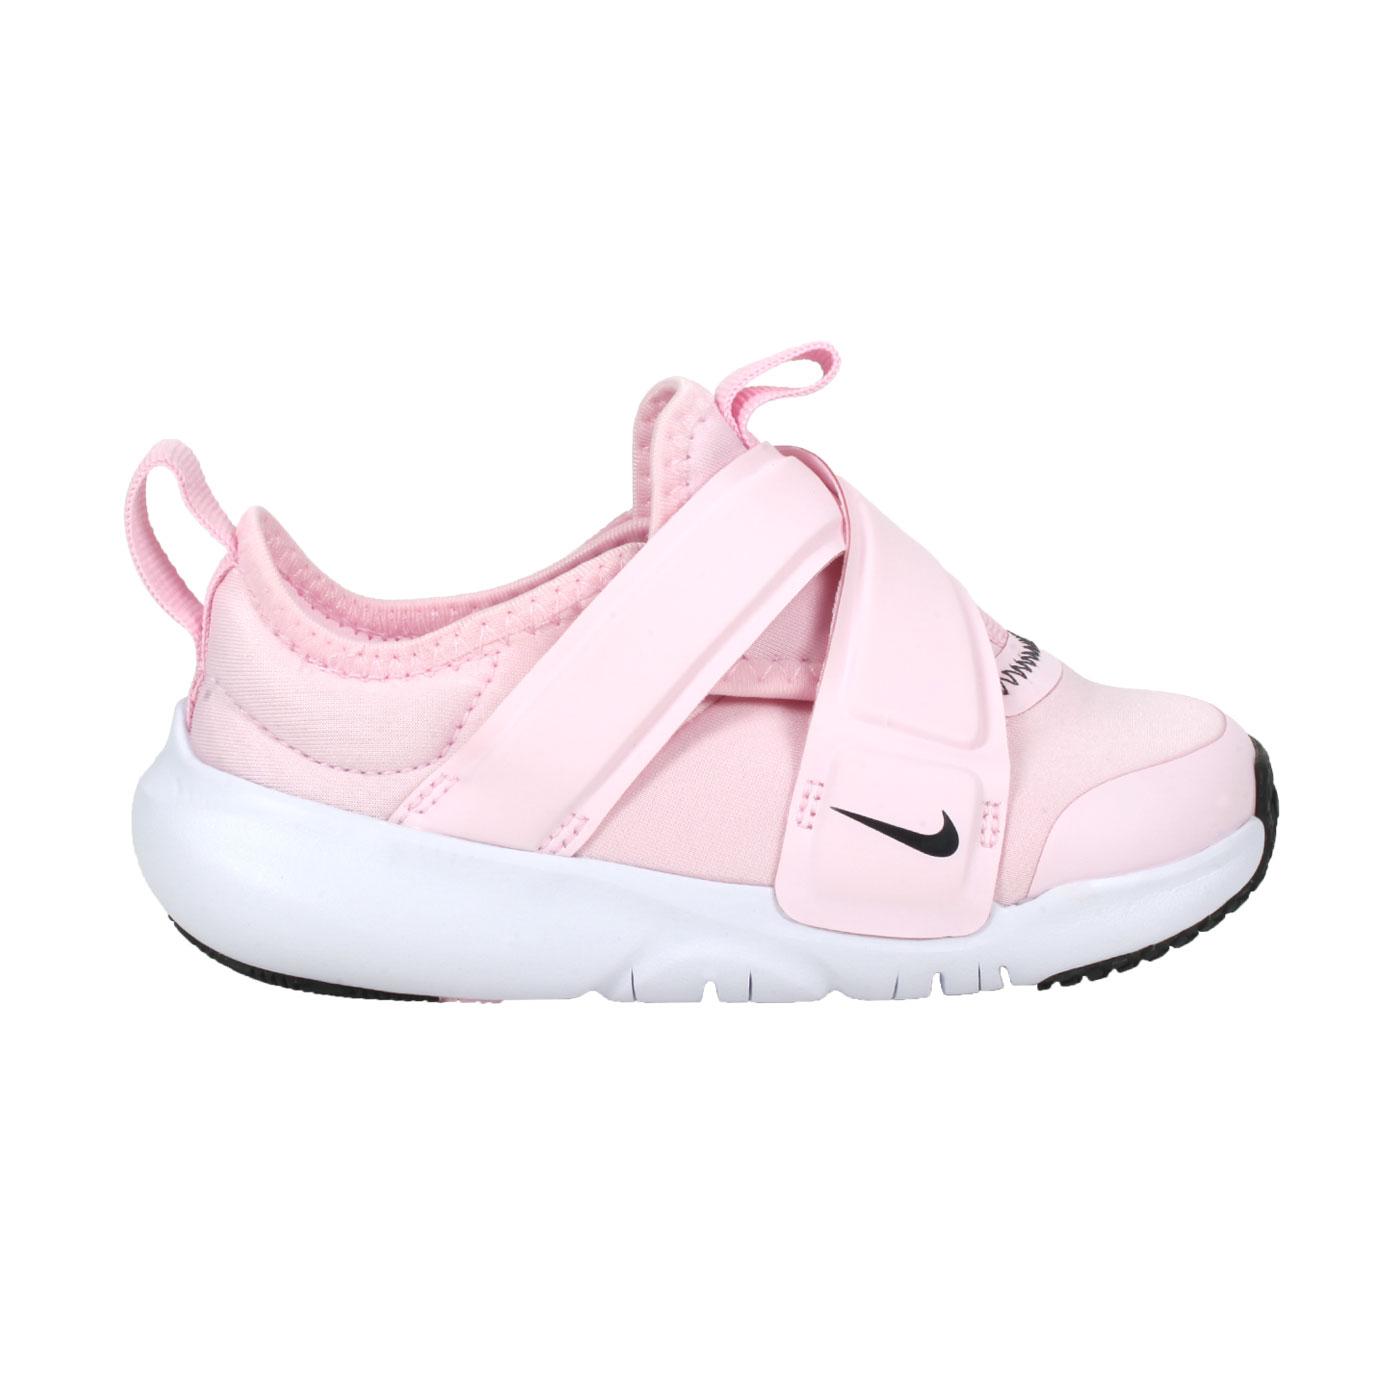 NIKE 小童運動鞋  @FLEX ADVANCE(TD)@CZ0188600 - 粉紅黑